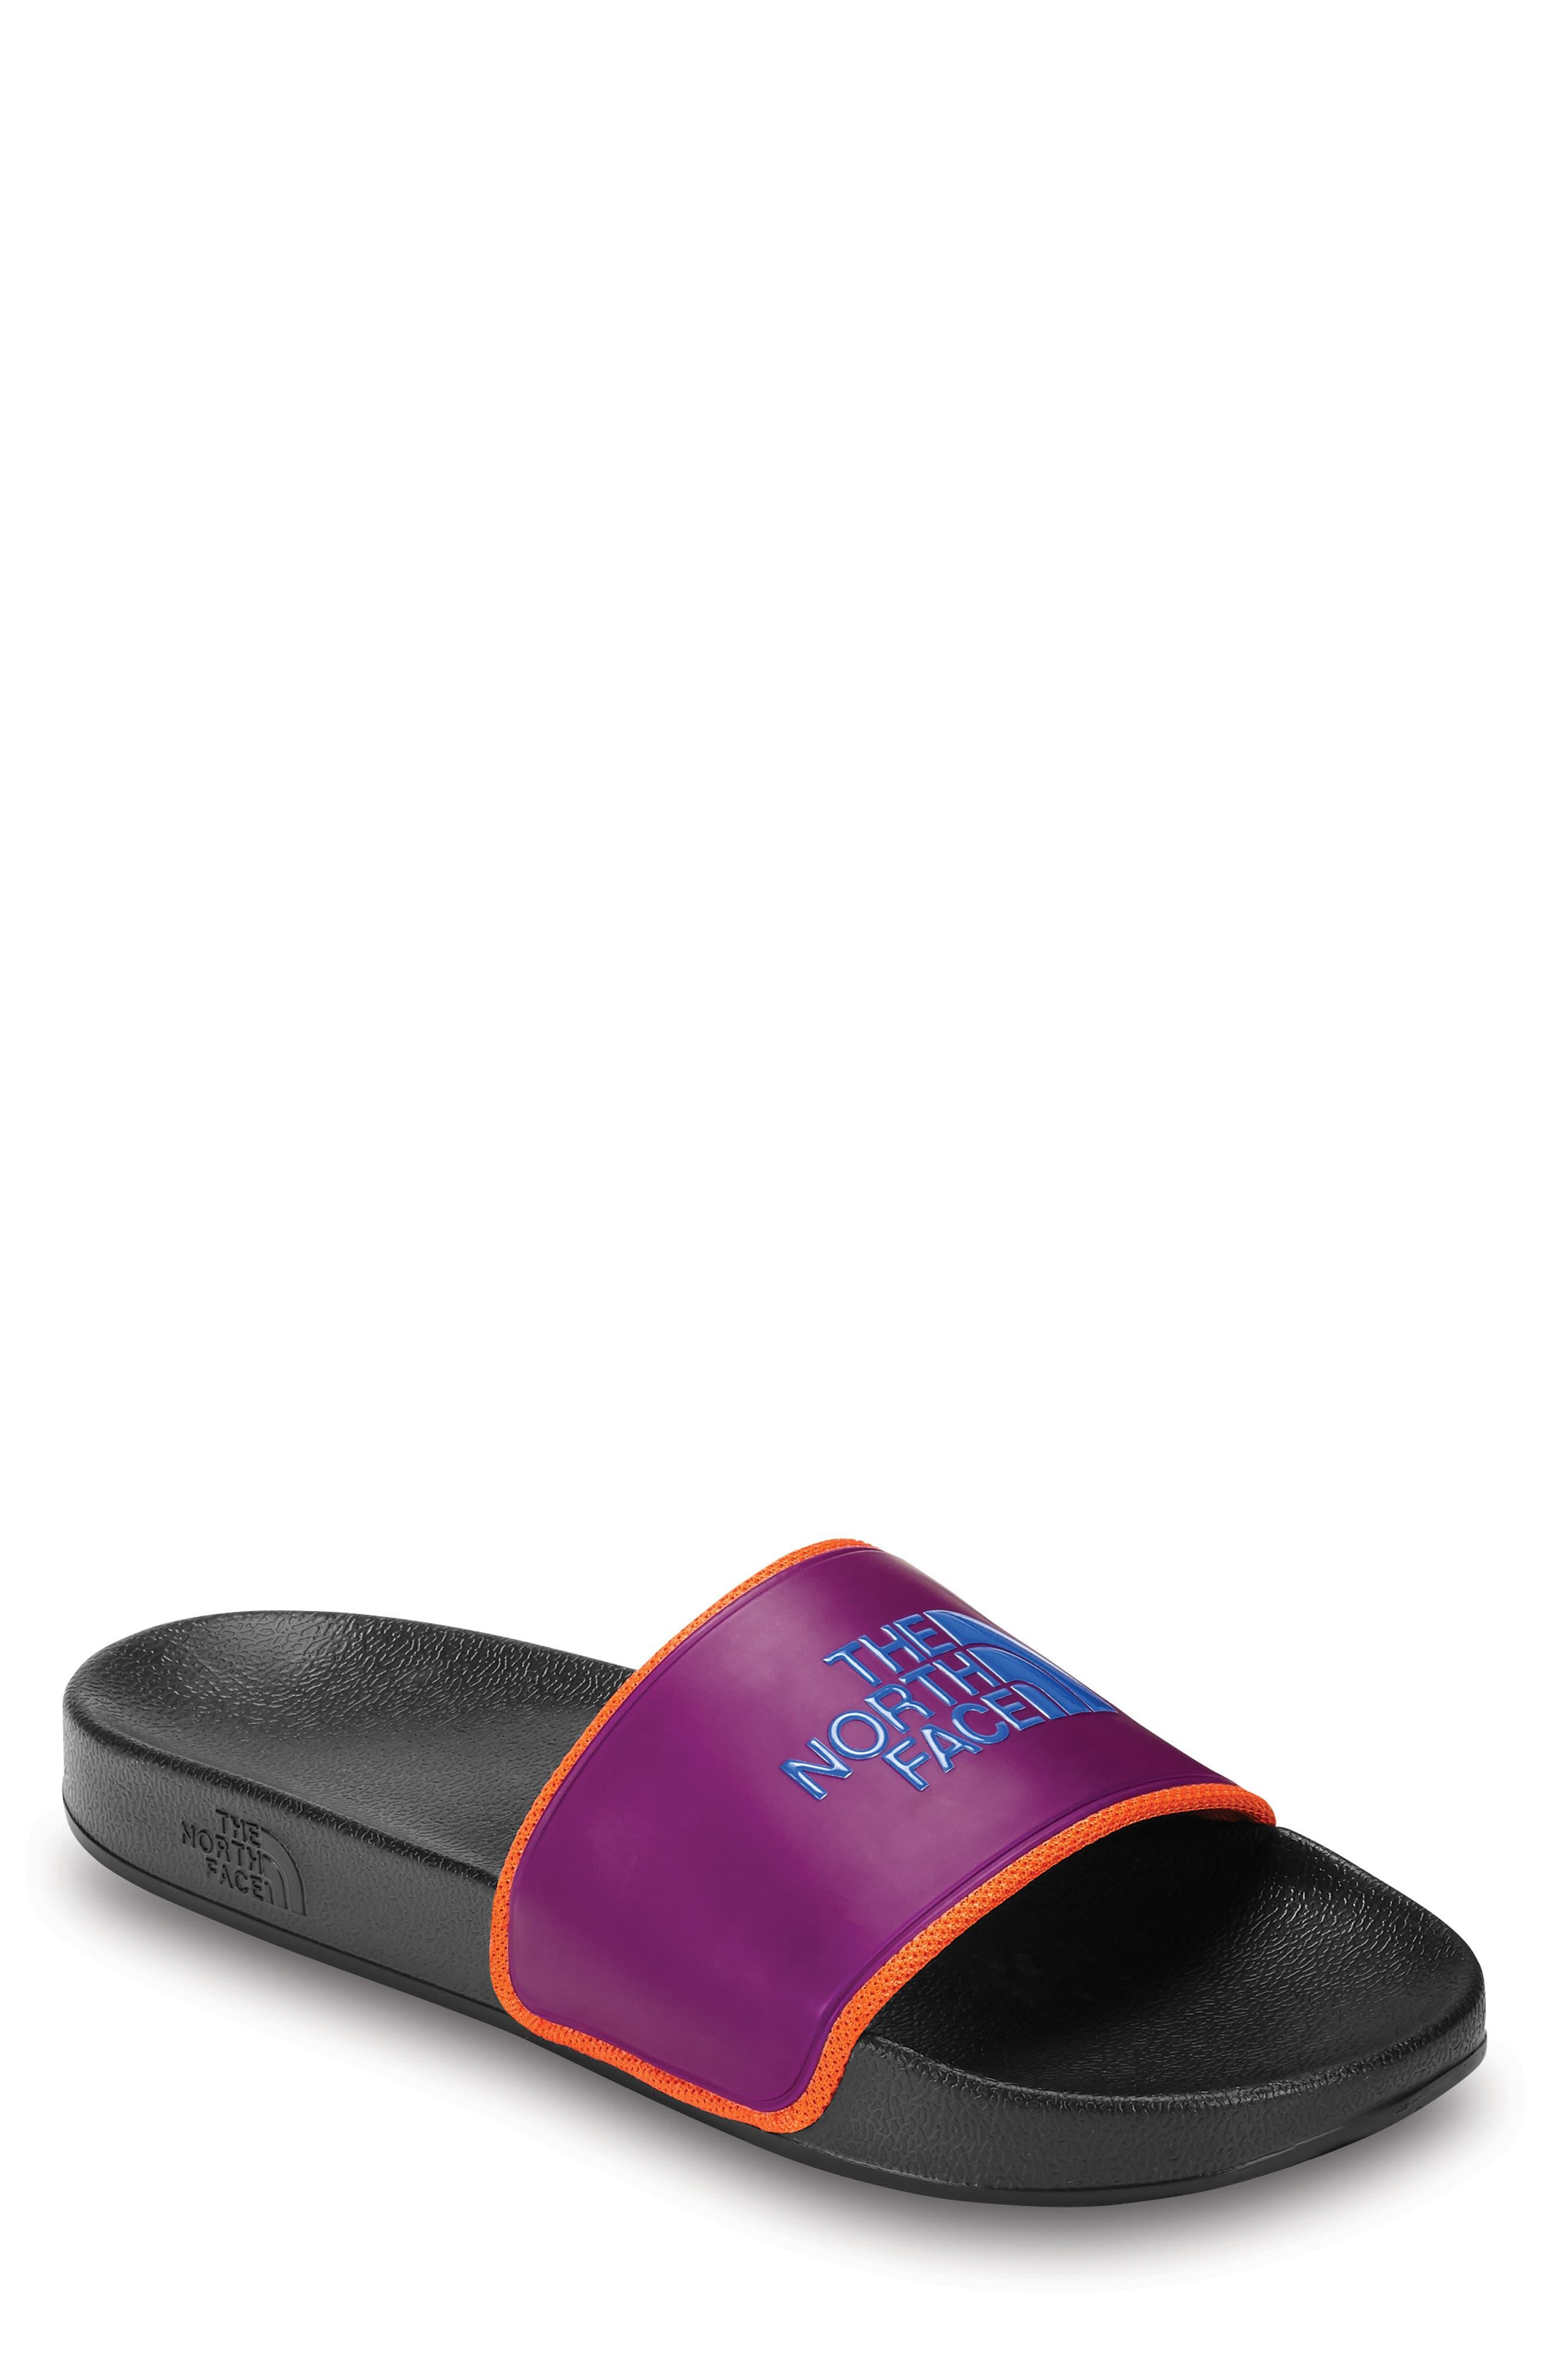 Base Camp II Slide Sandal,                             Alternate thumbnail 2, color,                             TNF BLACK/ AZTEC BLUE